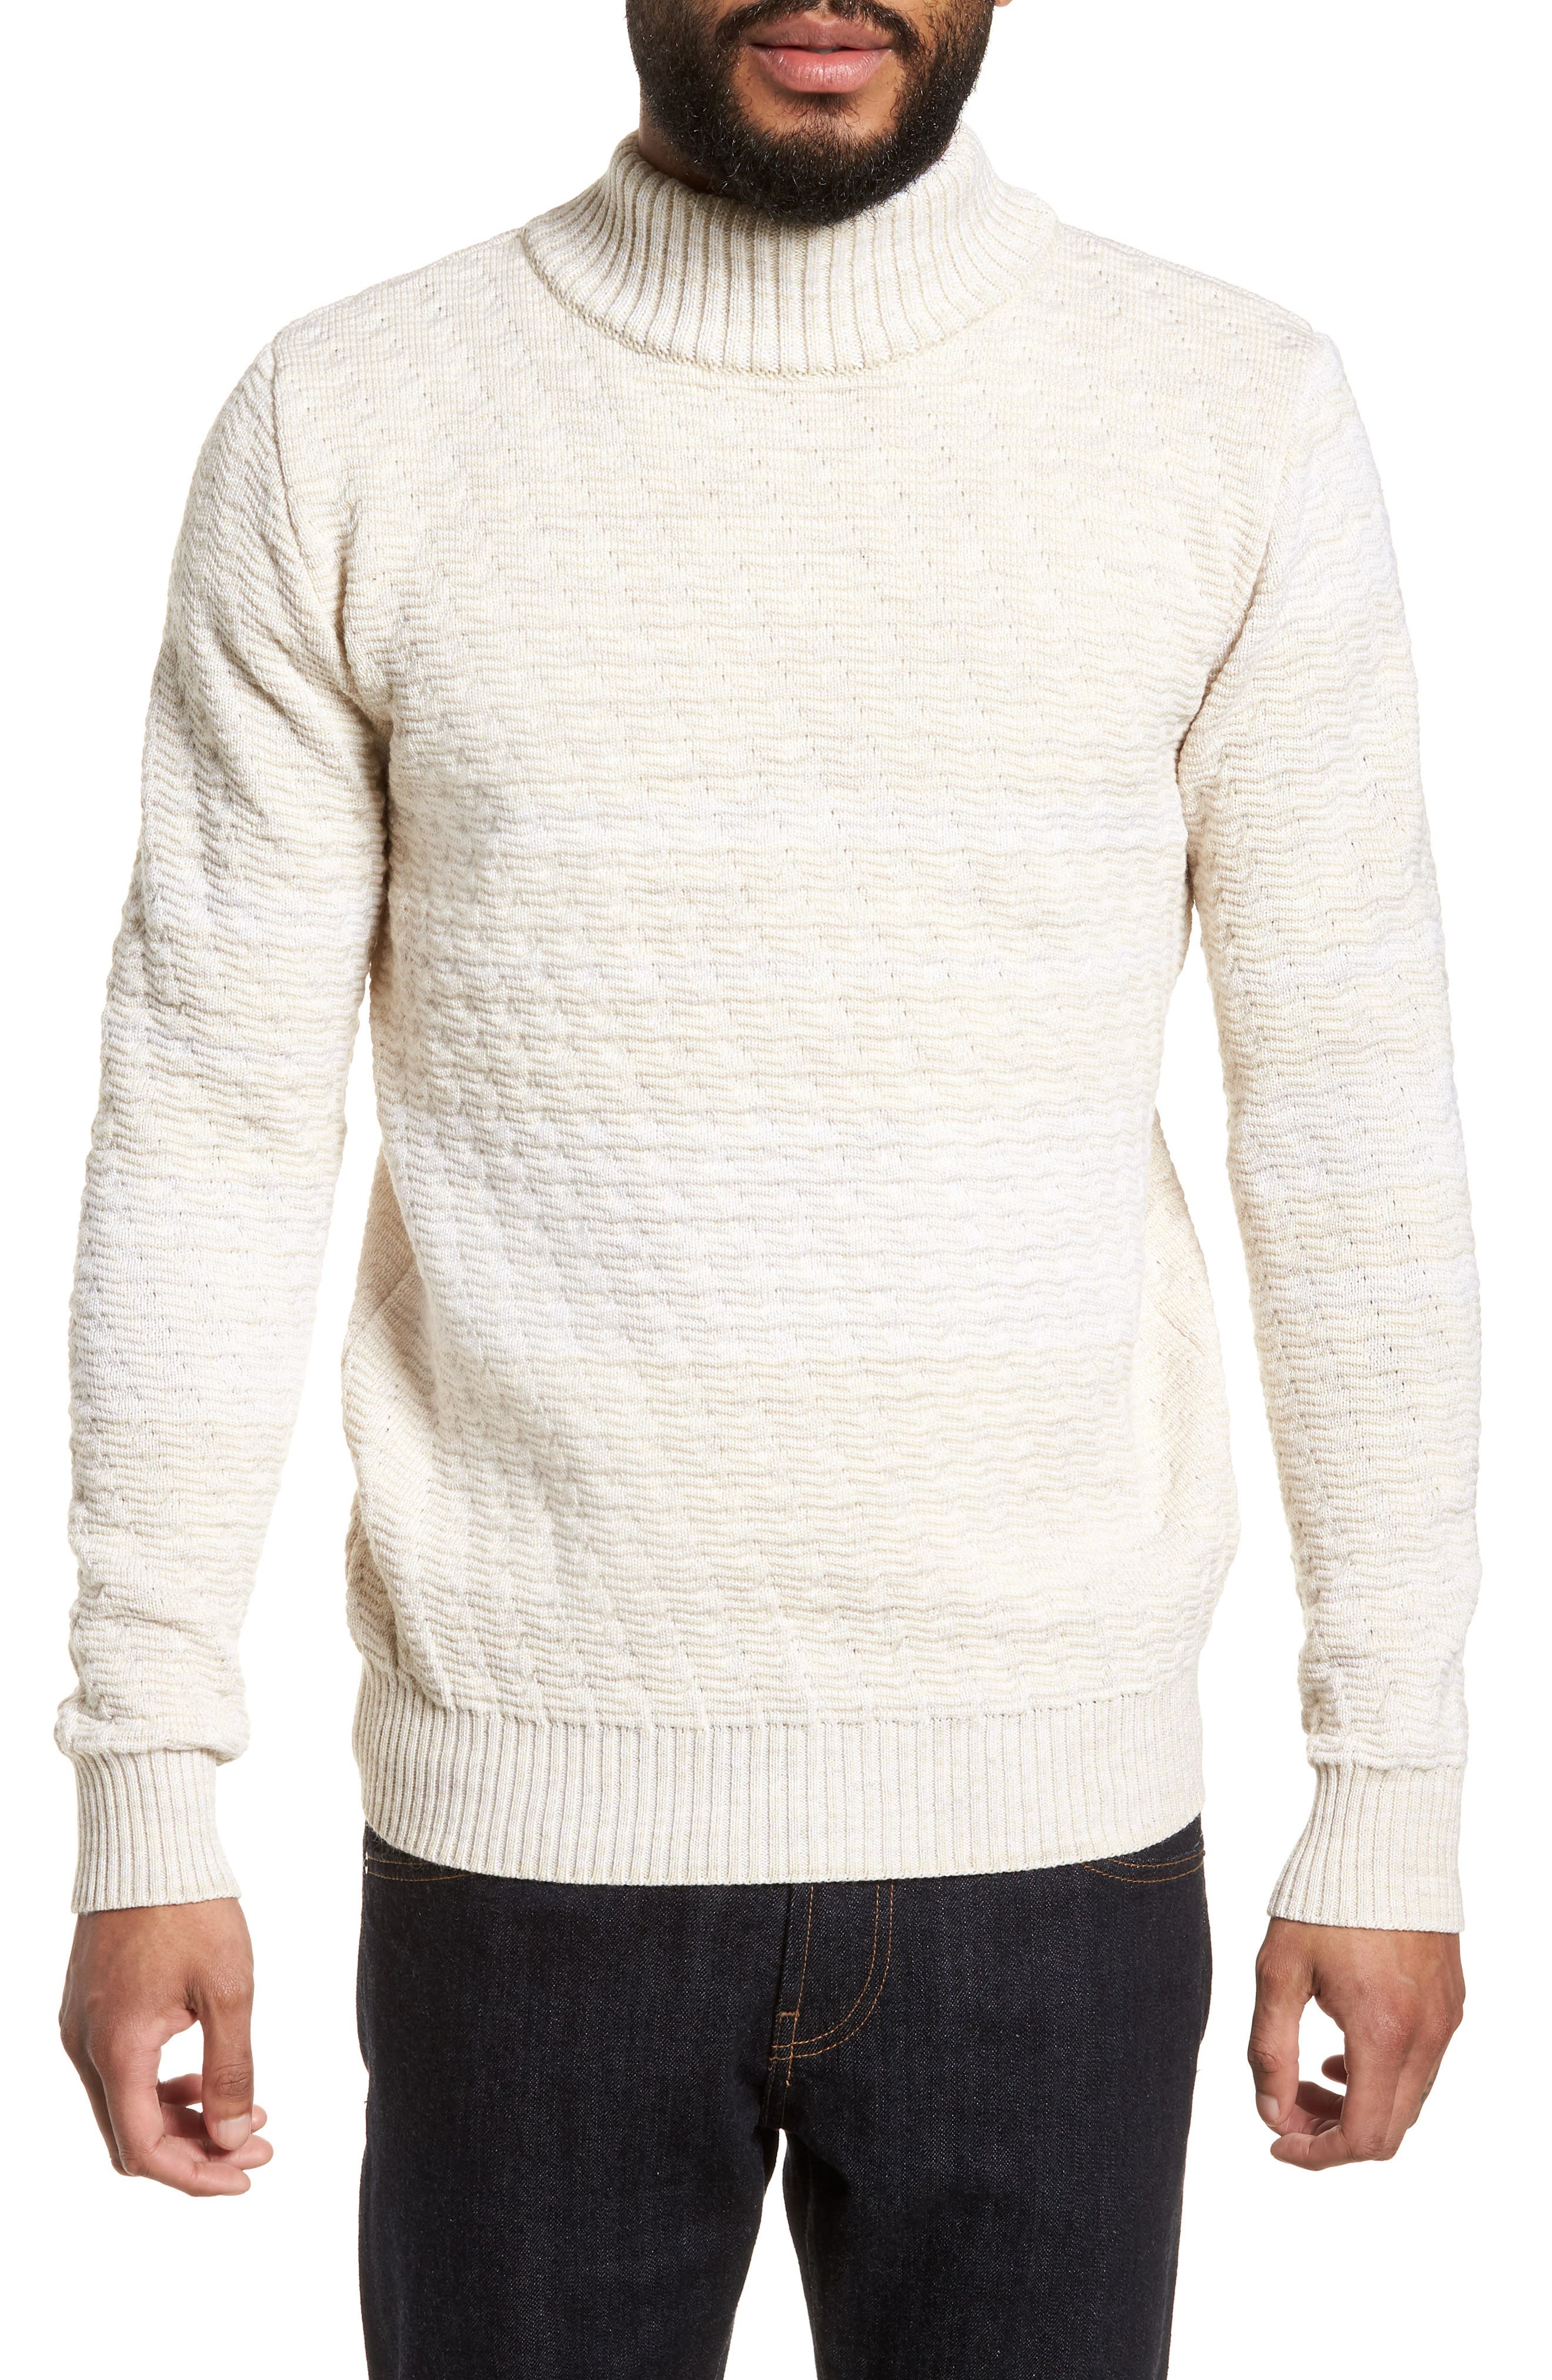 S.N.S. Herning Evident Wool Turtleneck Sweater